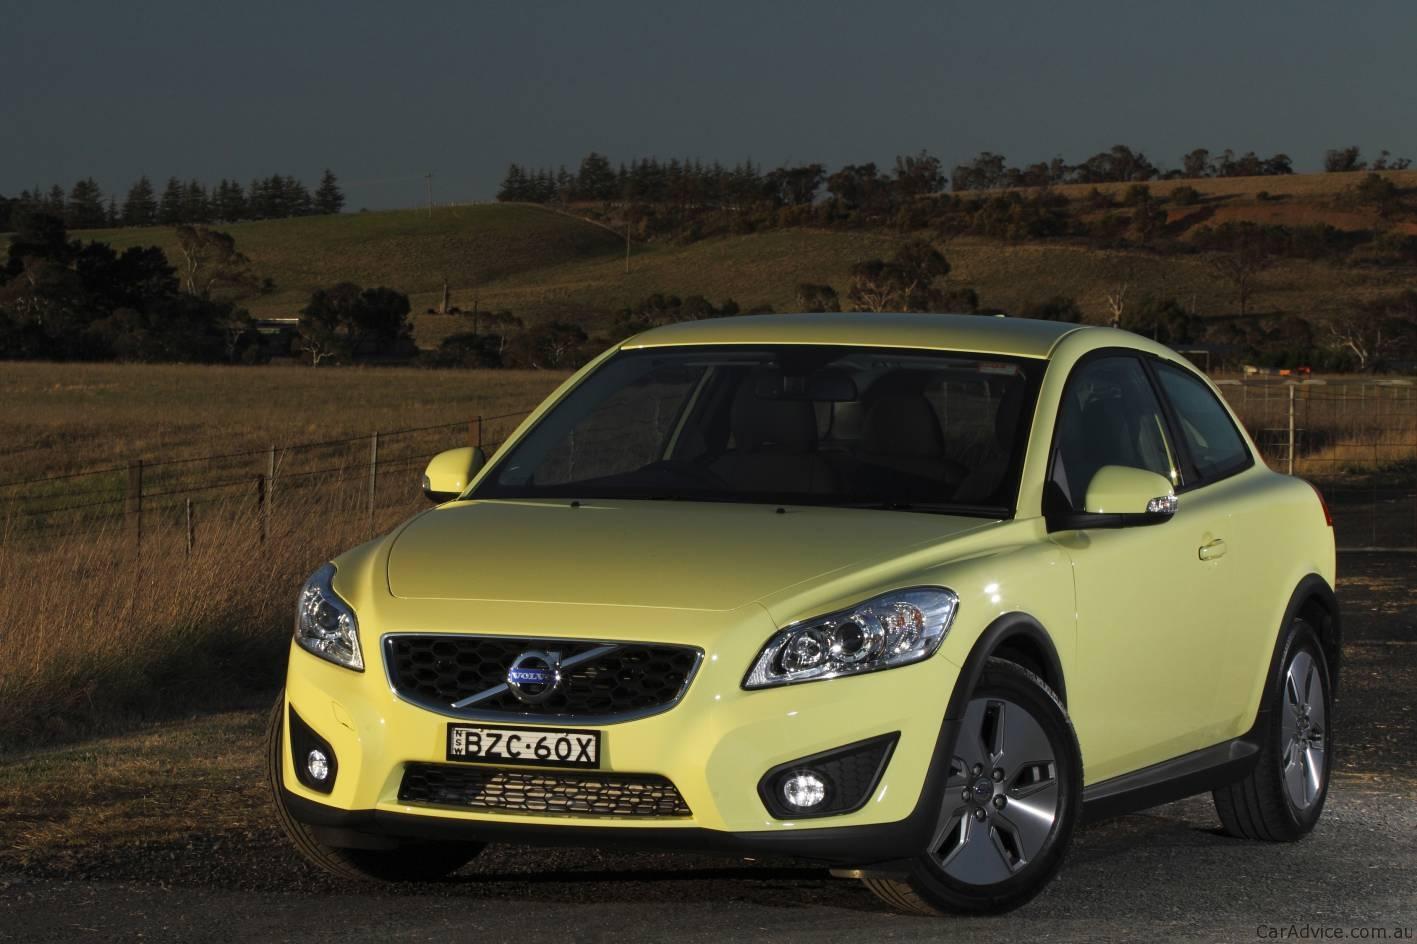 2012 Volvo C30 Update On Sale In Australia Photos